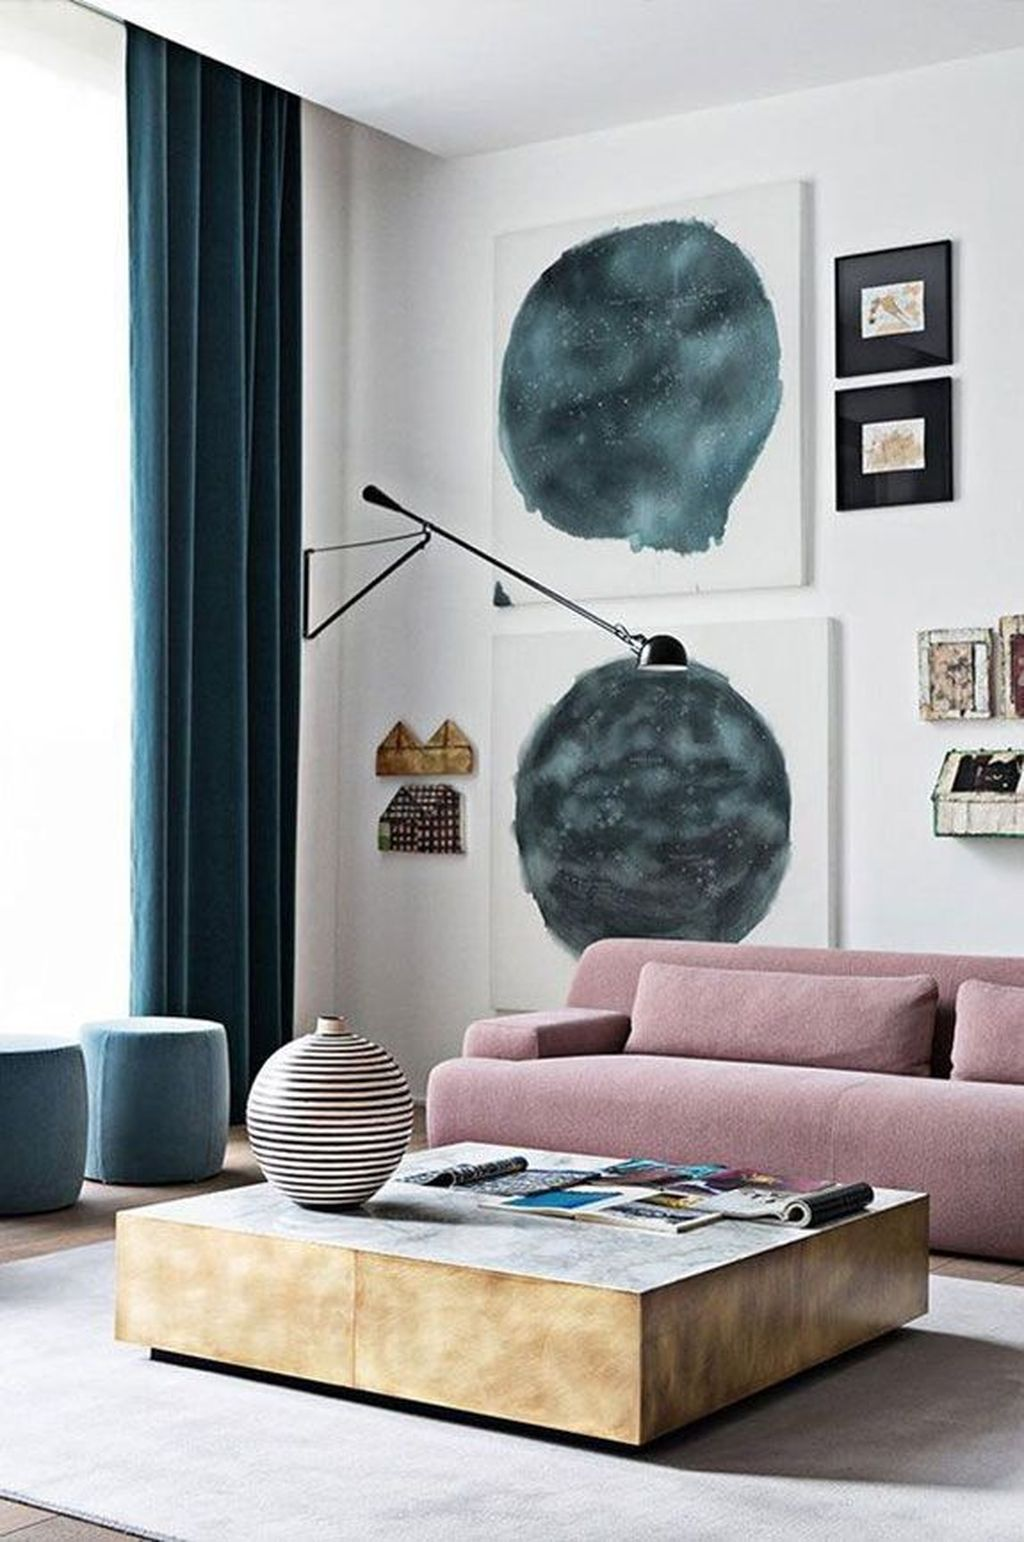 Inspiring Modern Home Furnishings Design Ideas 11